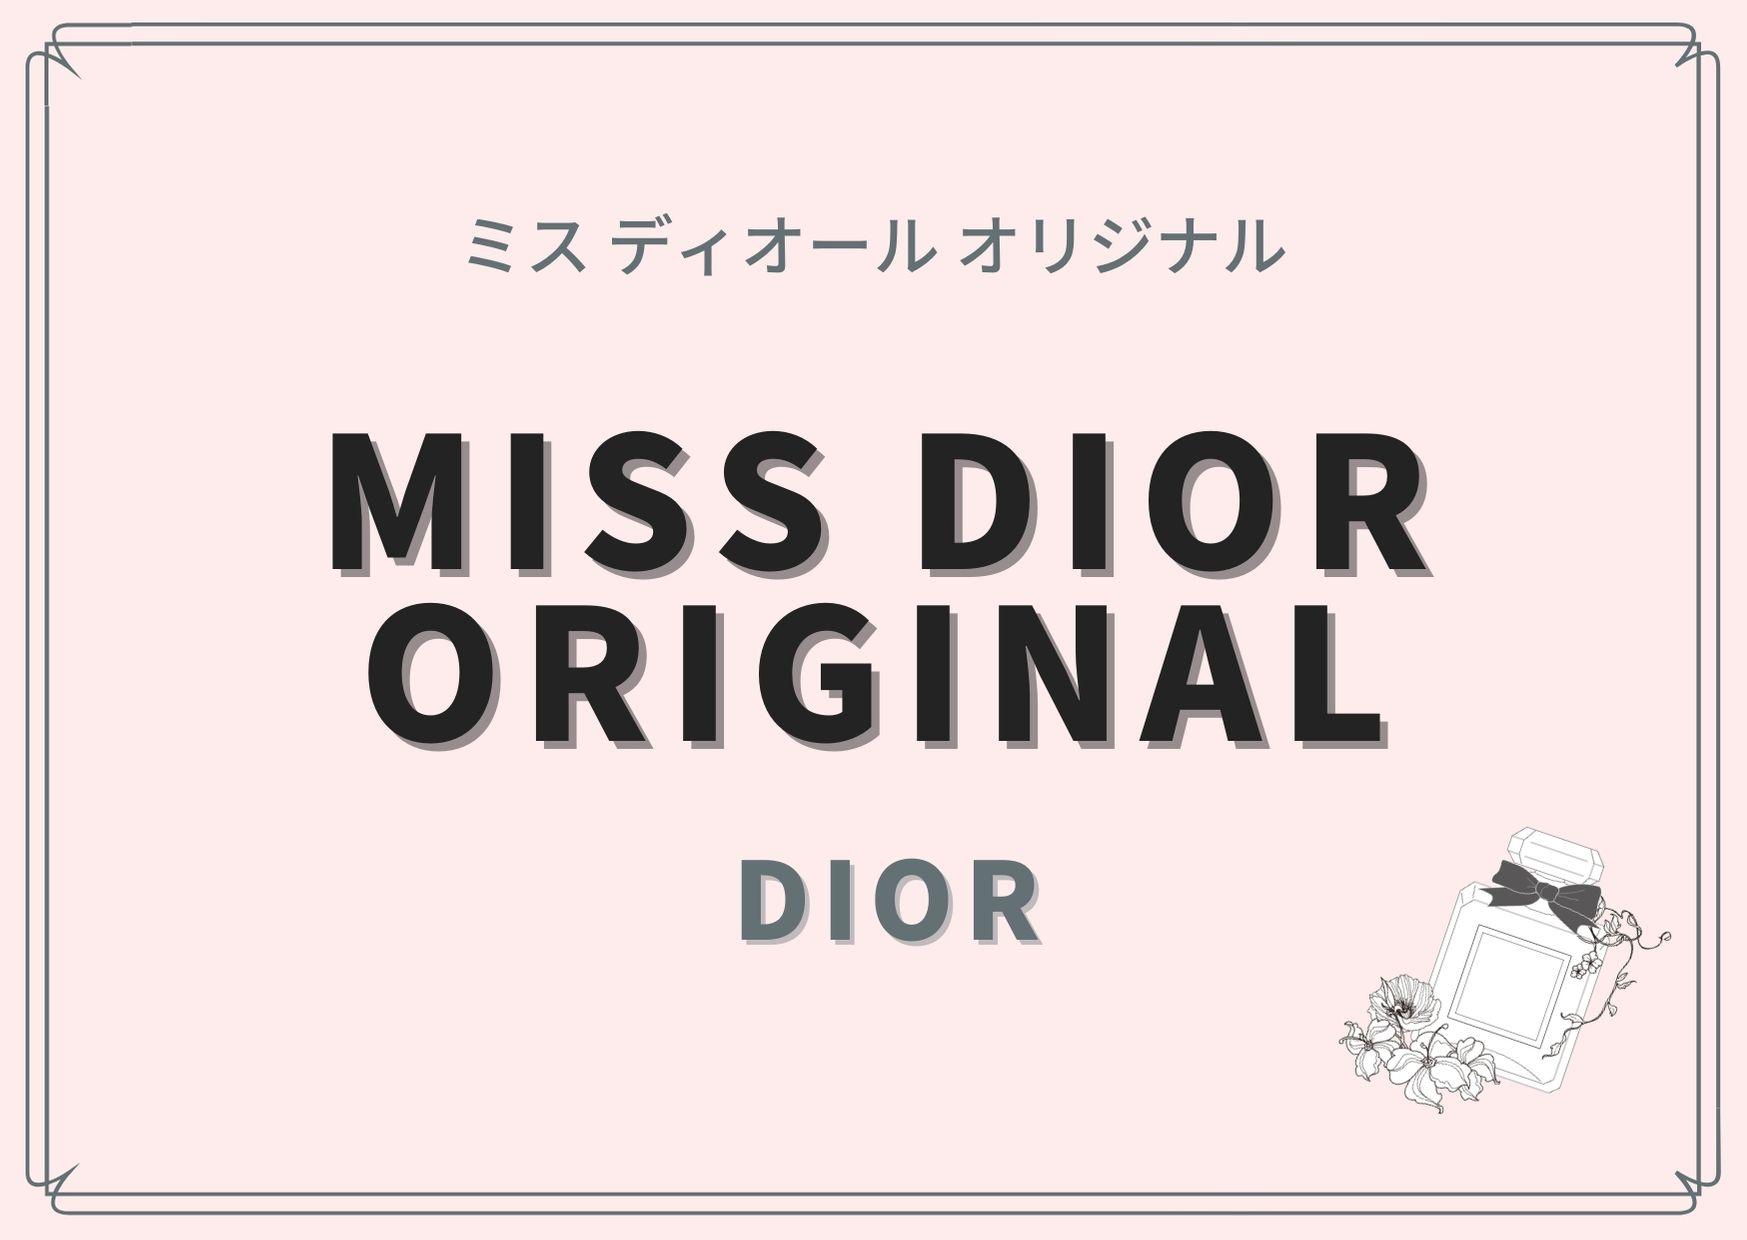 MISS DIOR ORIGINAL(ミス ディオール オリジナル)/DIOR(ディオール)